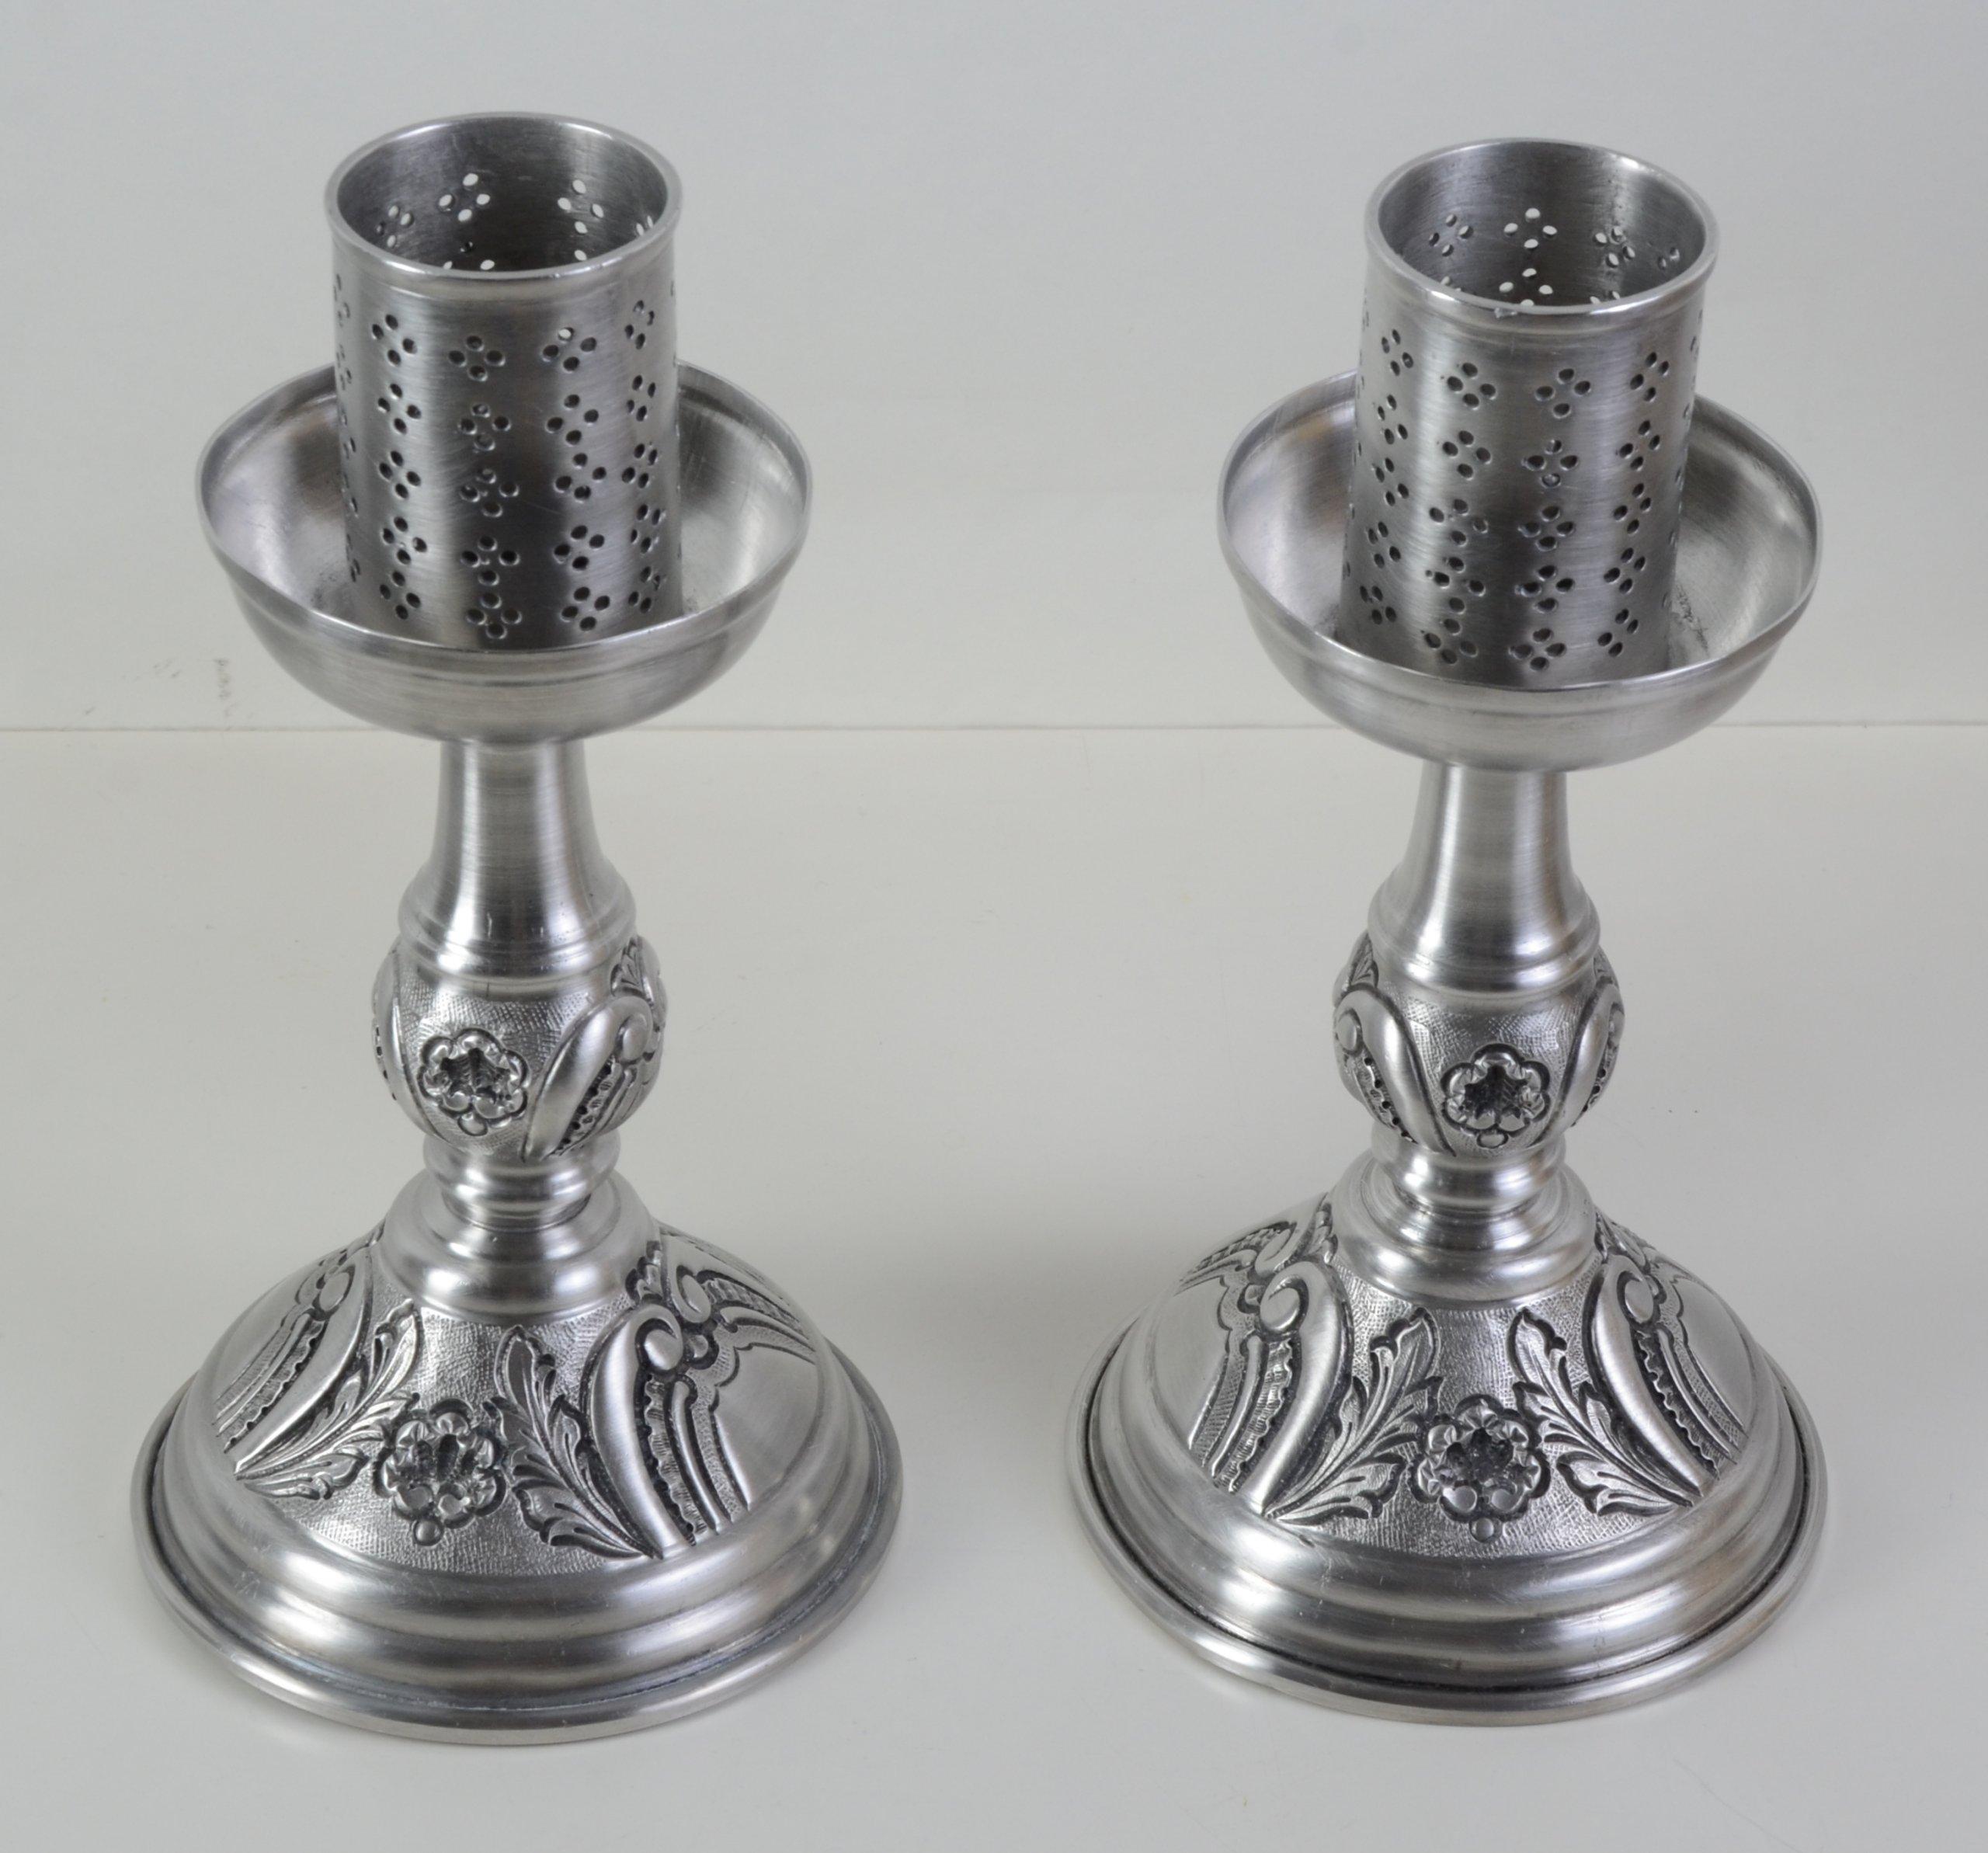 Komplet 2 x srebrny świecznik duży Hiszp.453